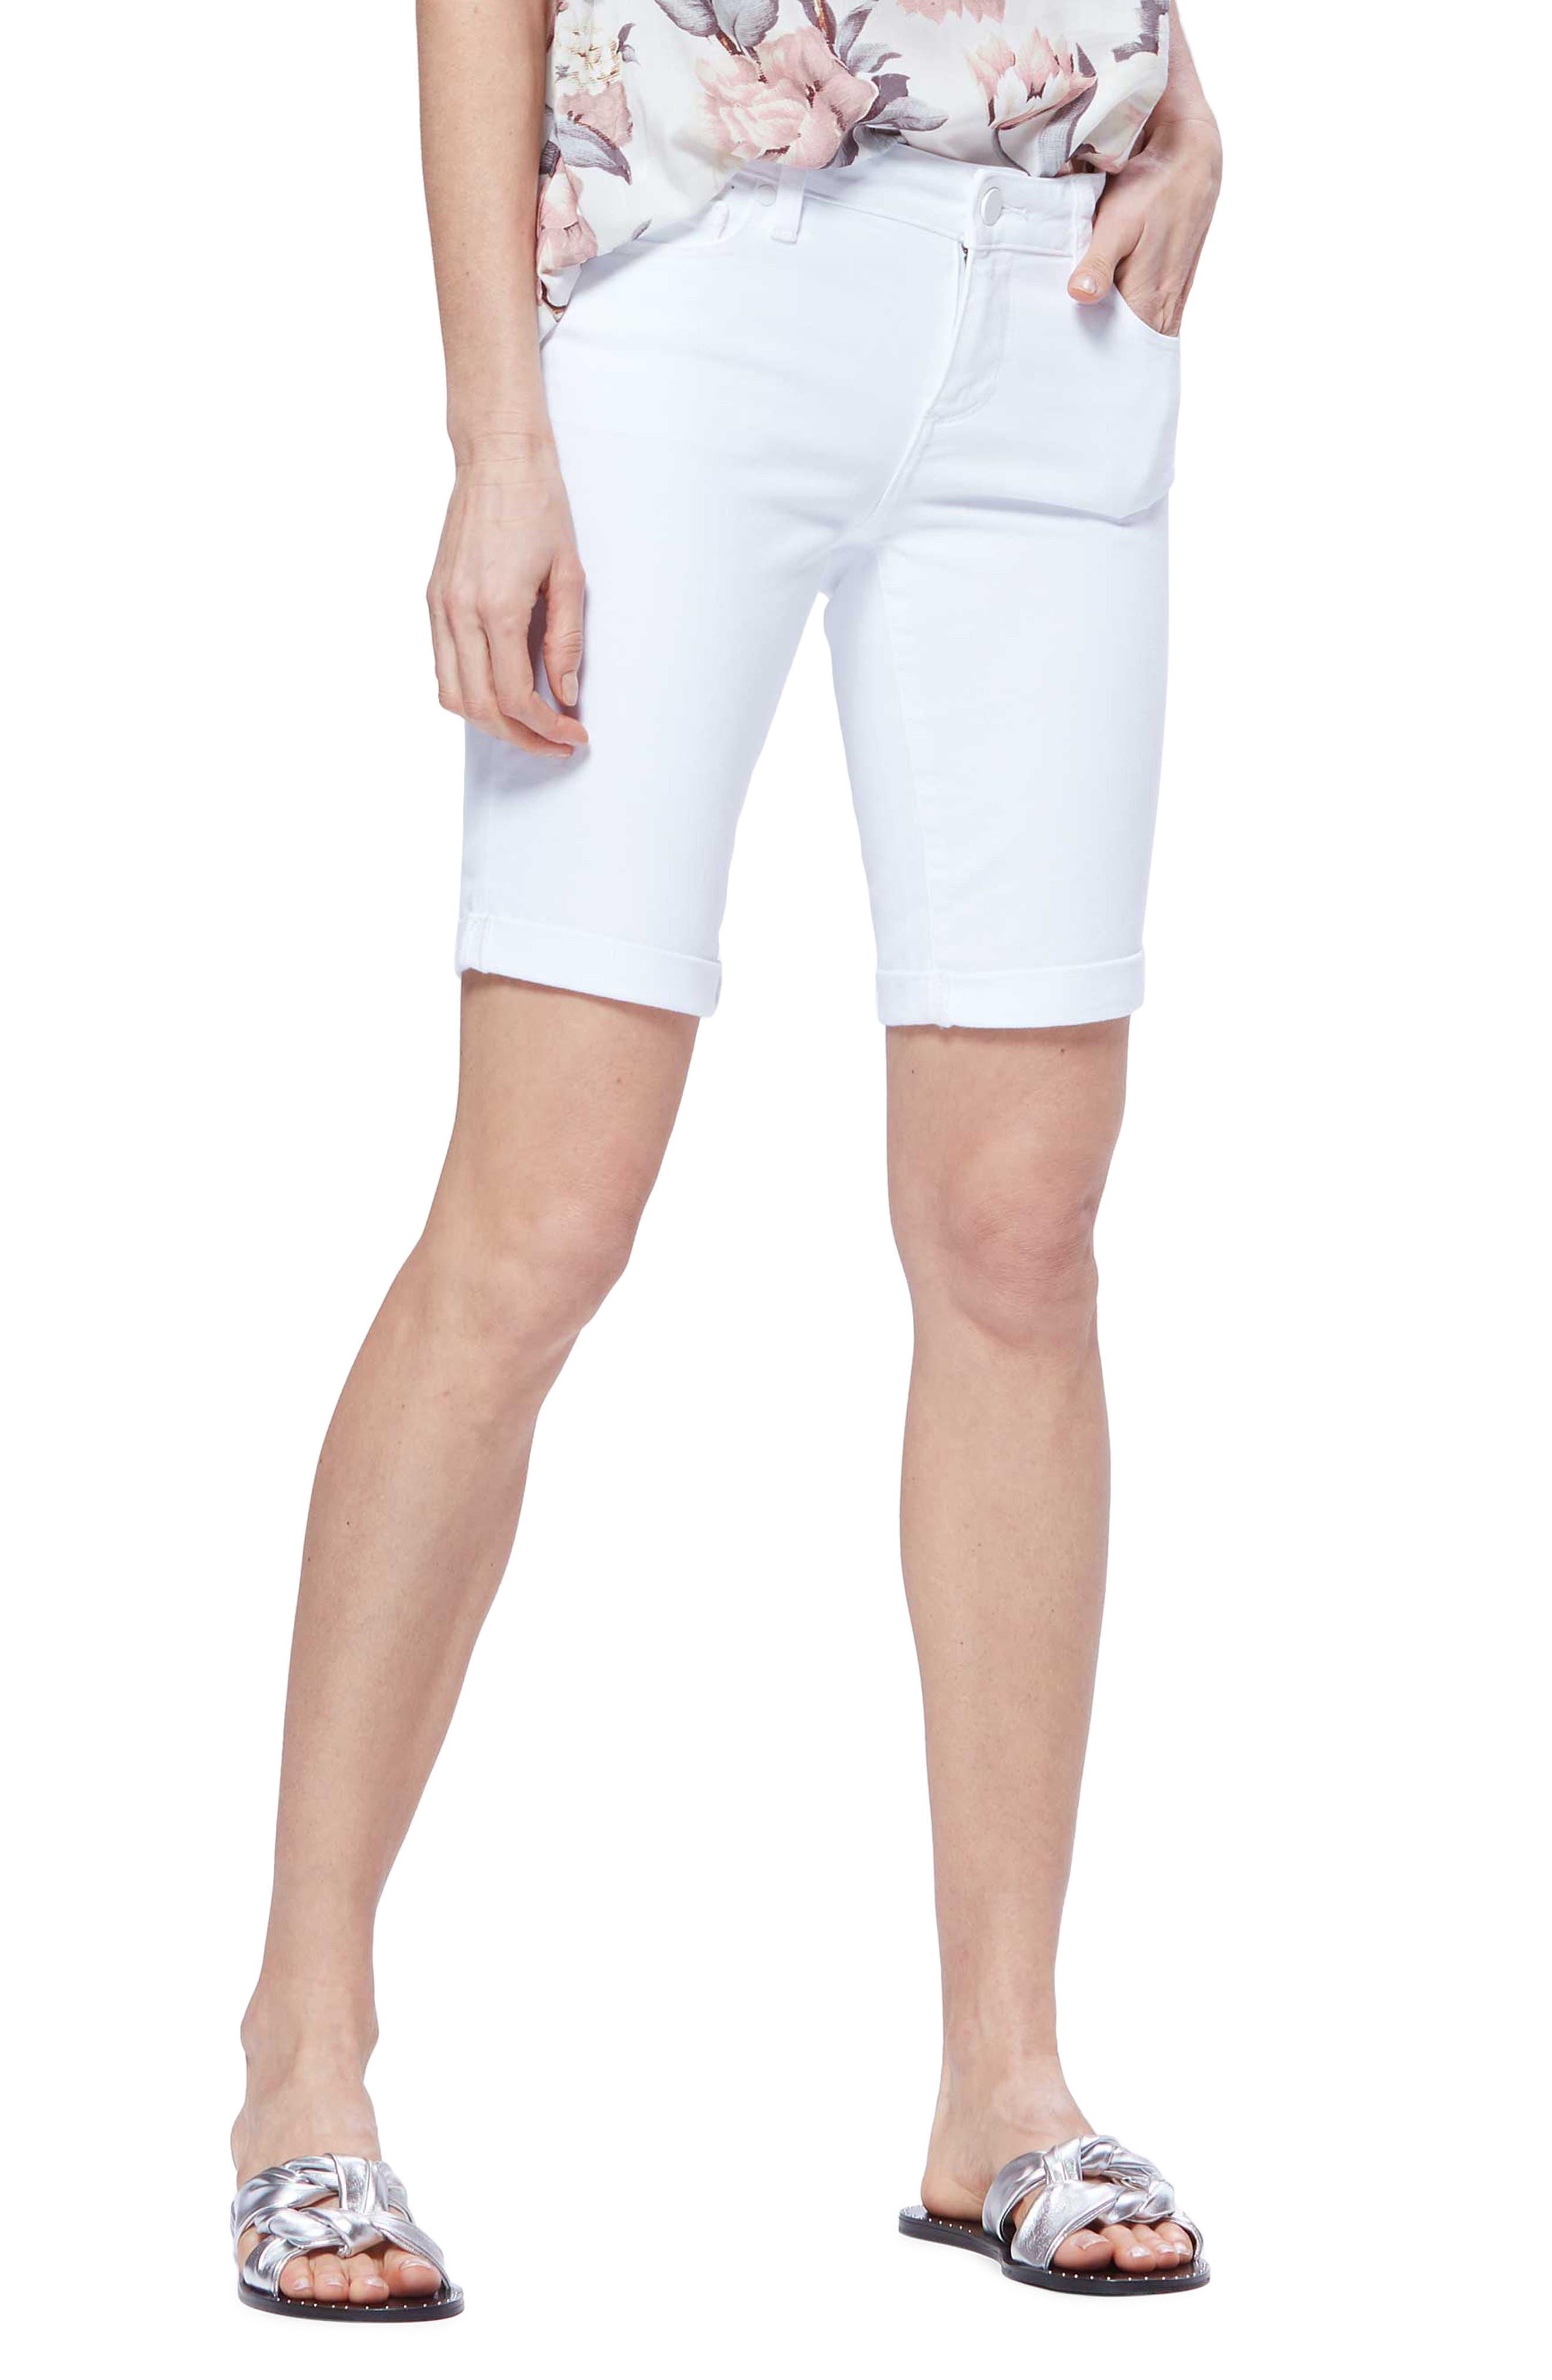 PAIGE,                             Jax Denim Bermuda Shorts,                             Main thumbnail 1, color,                             CRISP WHITE